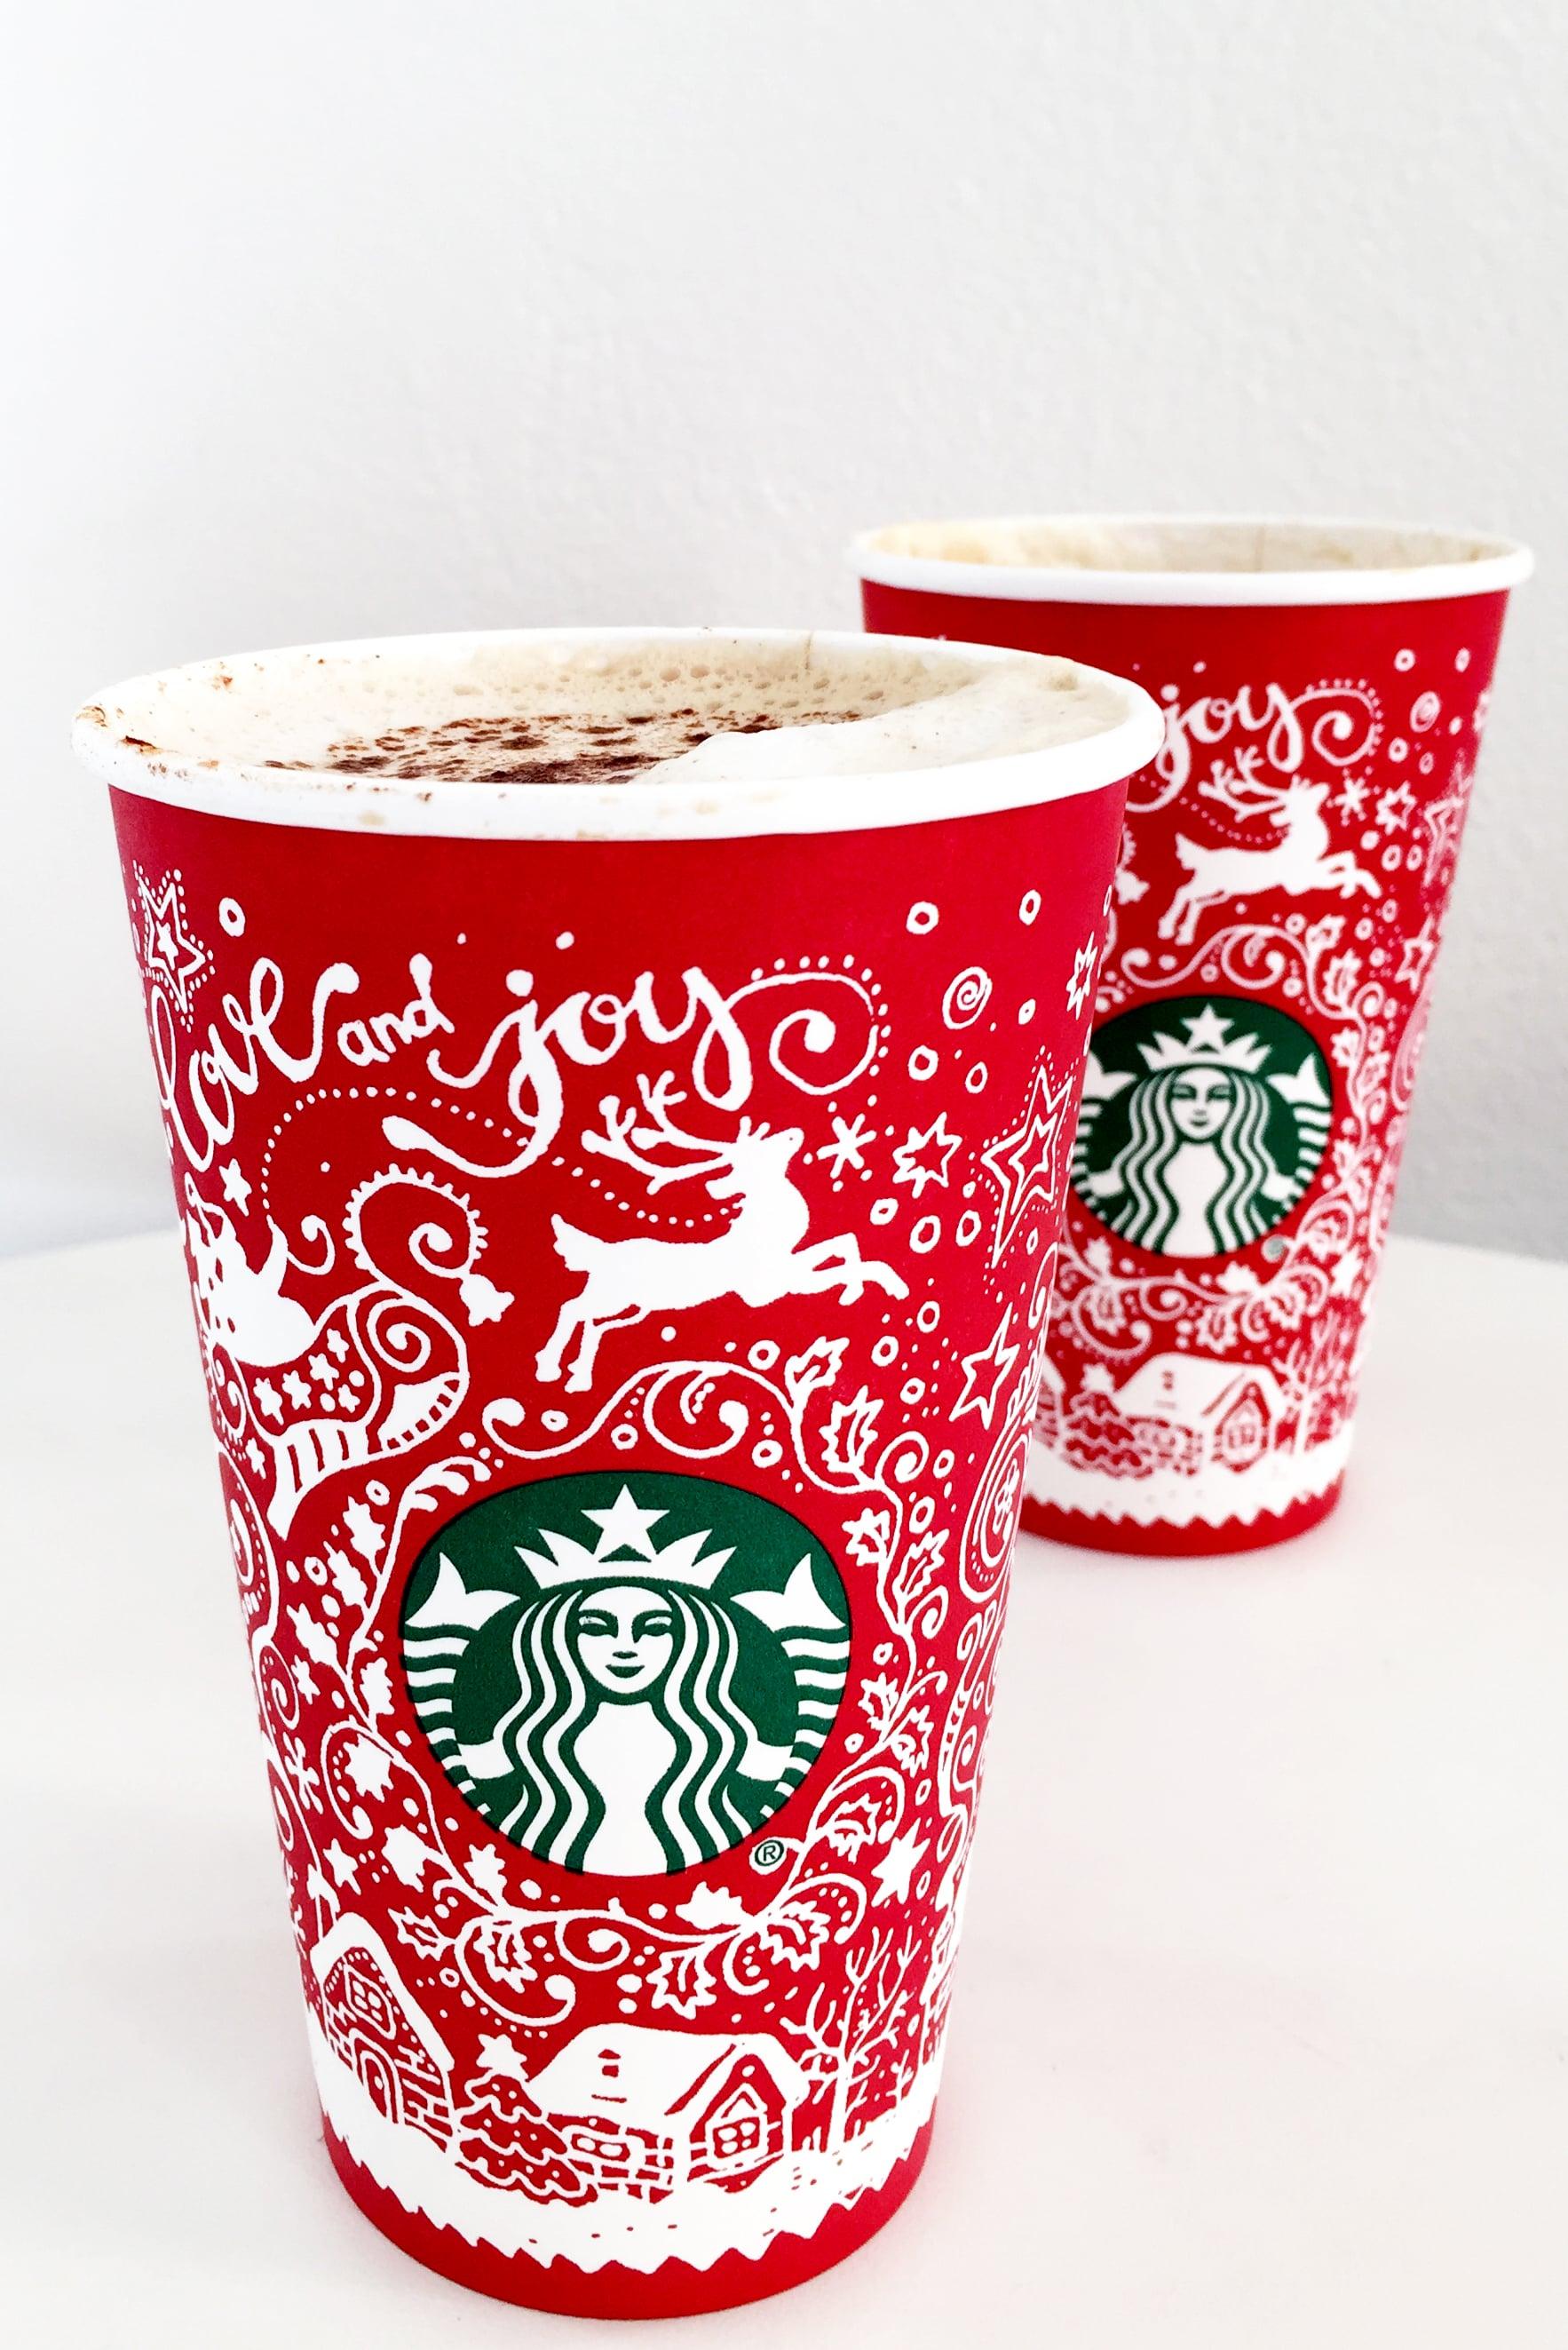 Starbucks Snickerdoodle Hot Cocoa Review | POPSUGAR Food